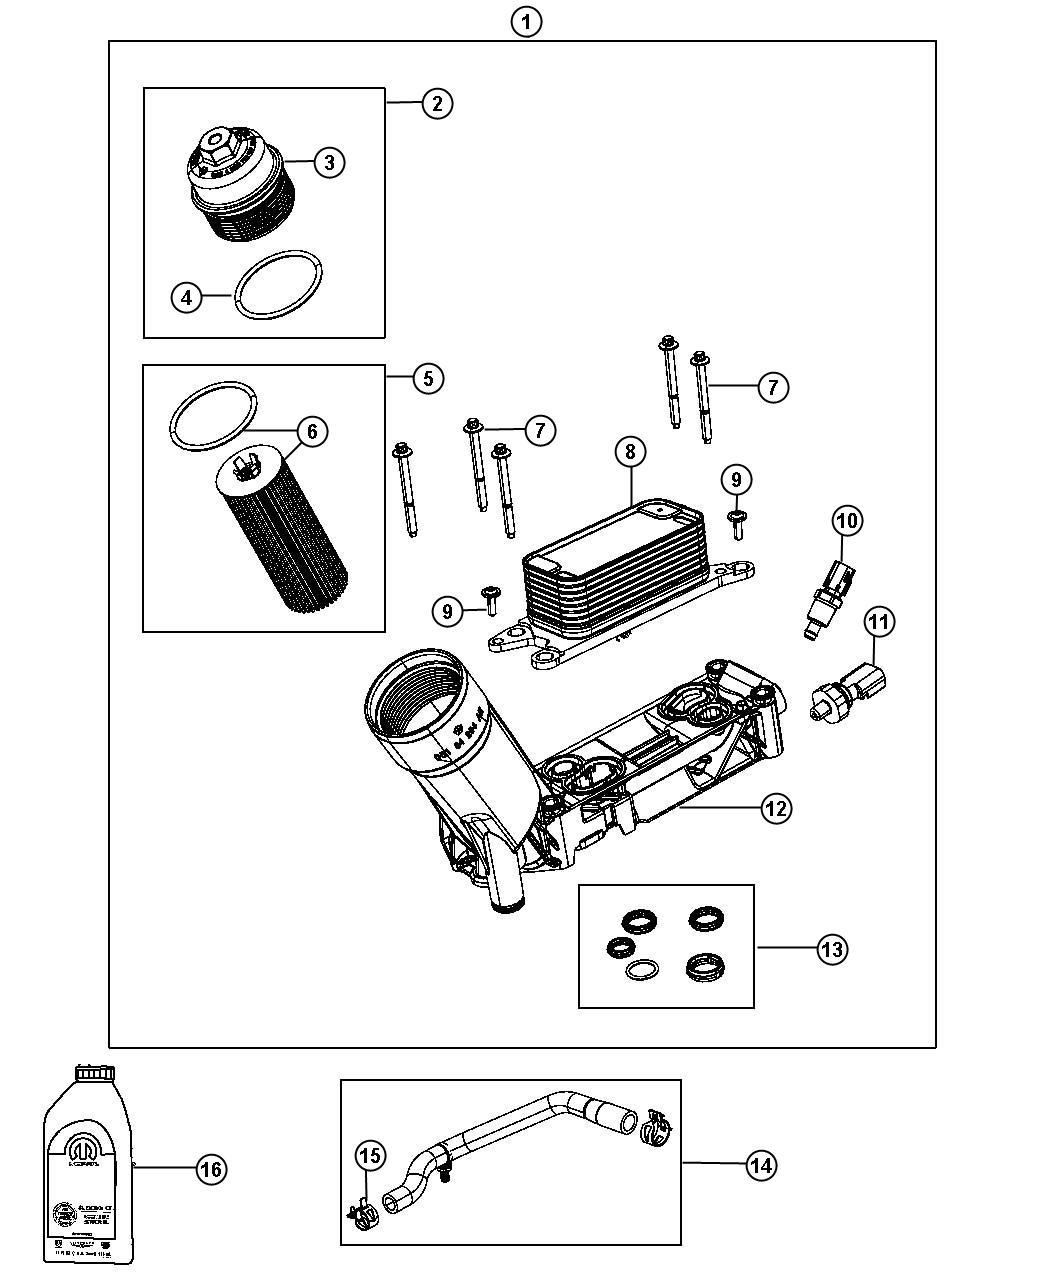 hight resolution of chrysler 440 wiring diagram